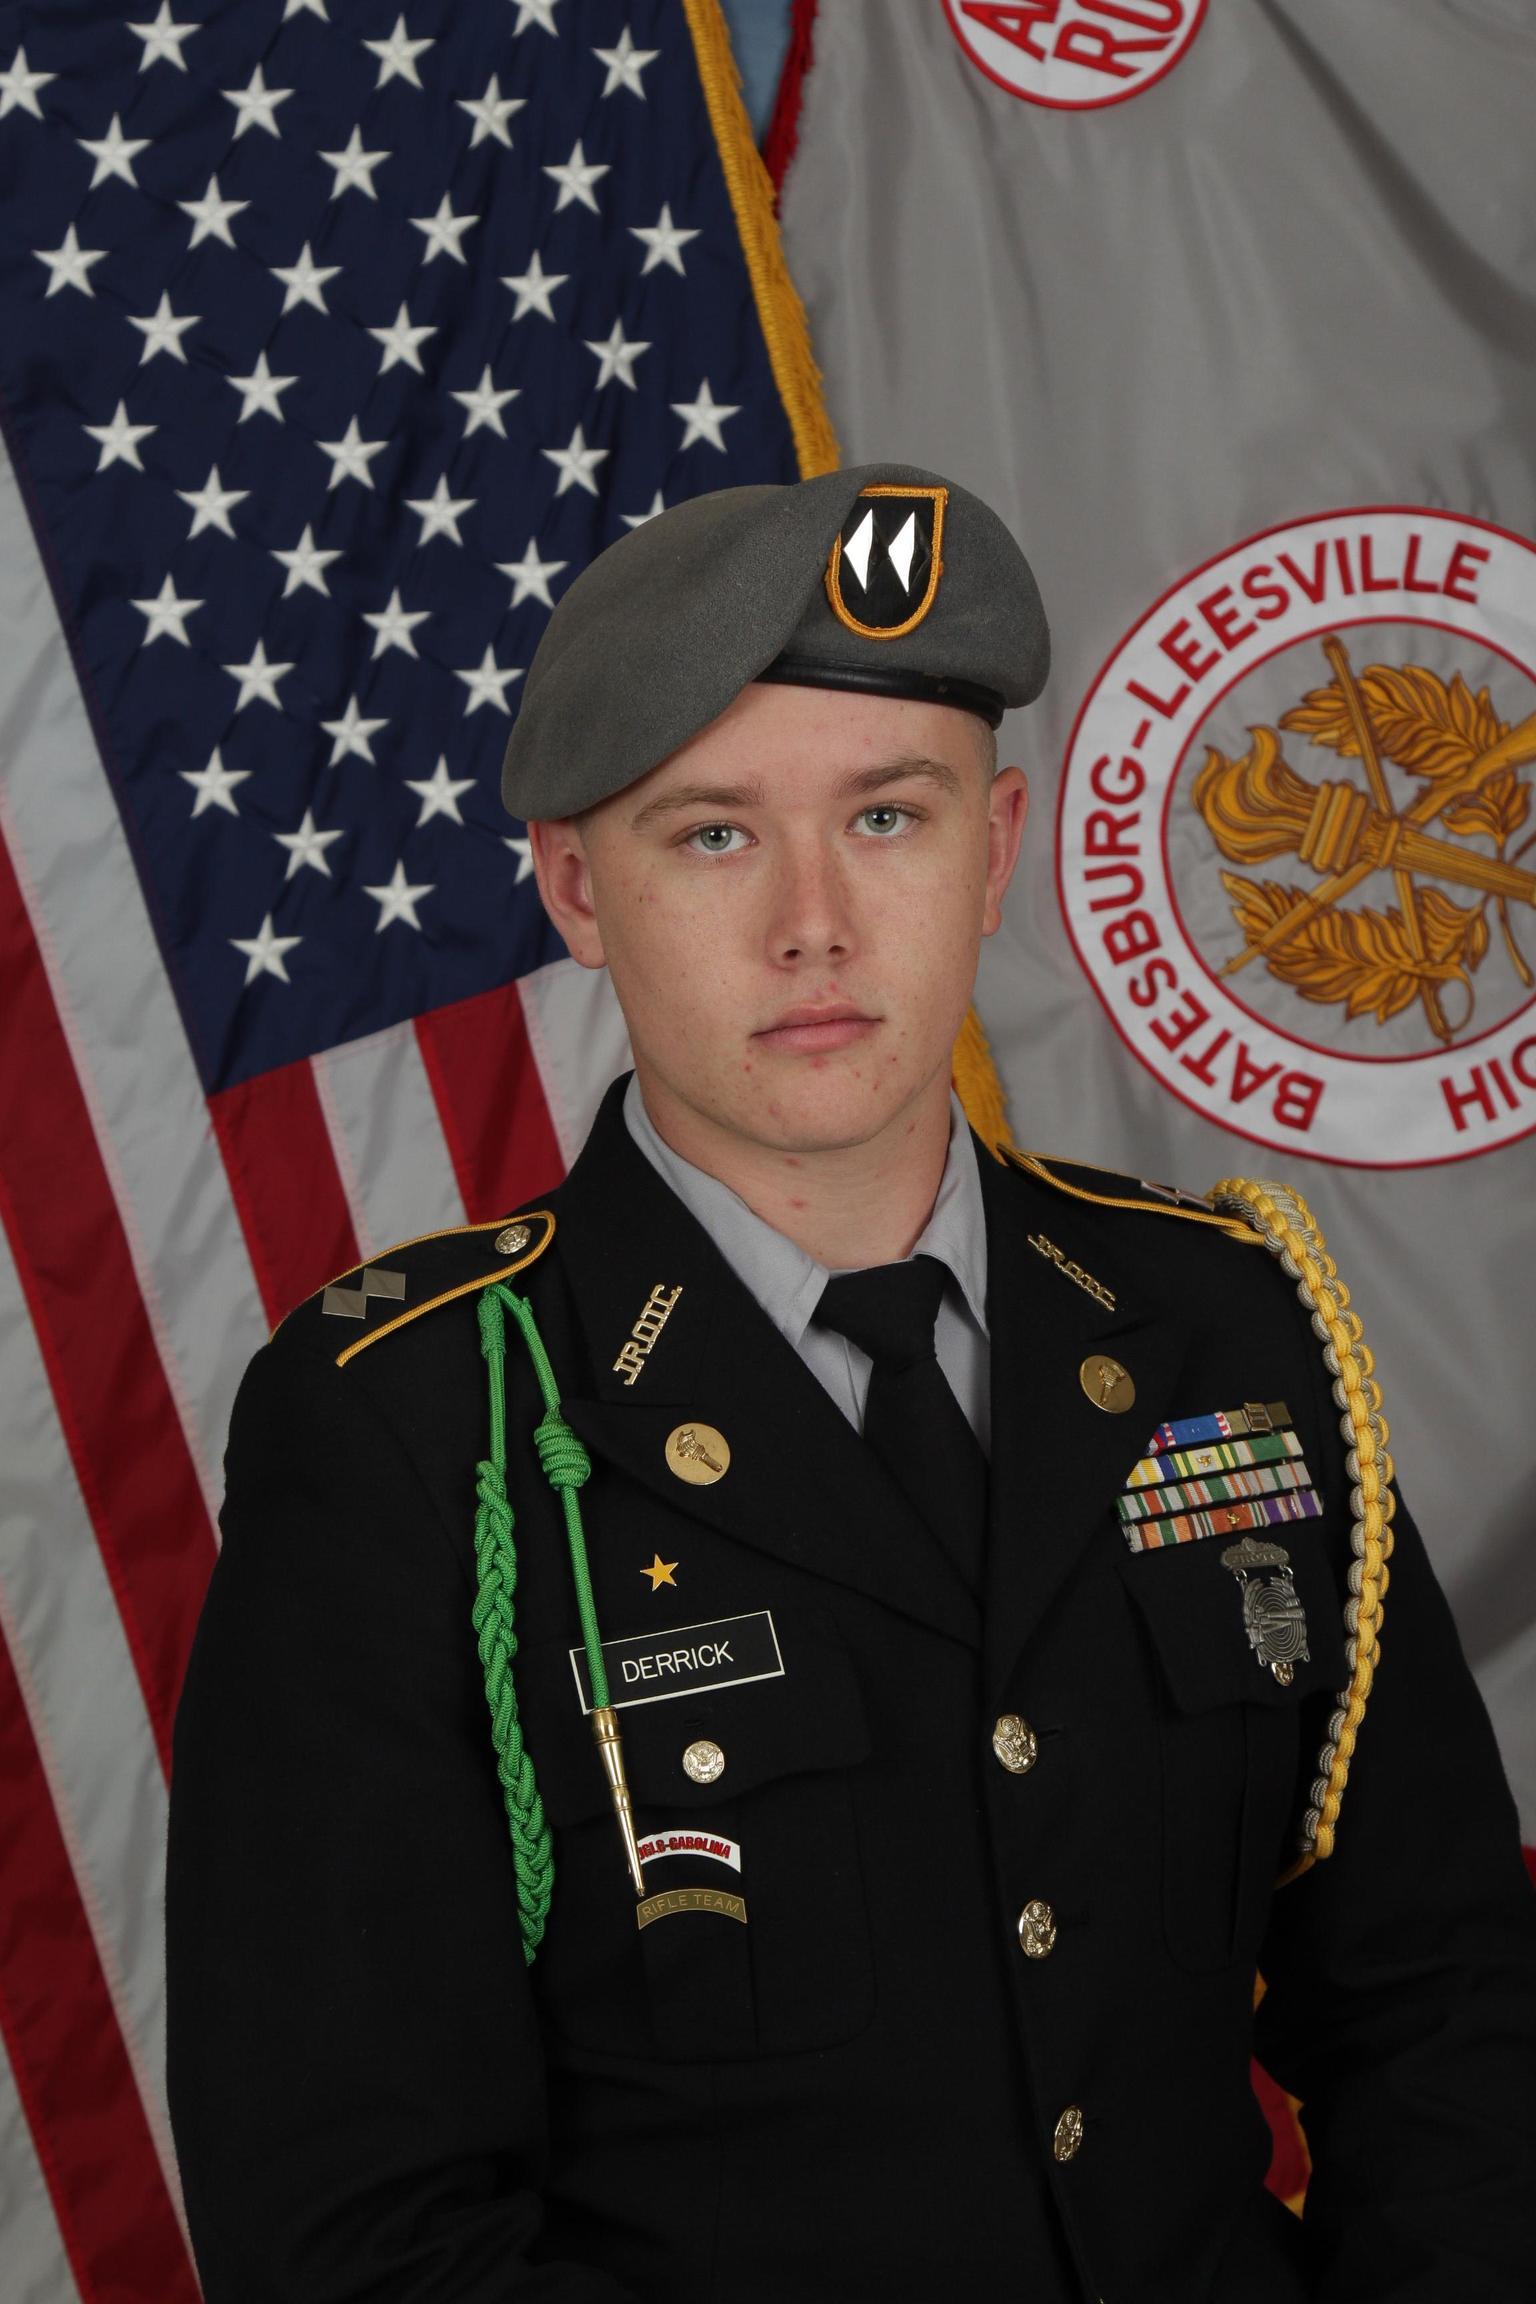 Panther Battalion Commander Cadet LTC Reid Derrick